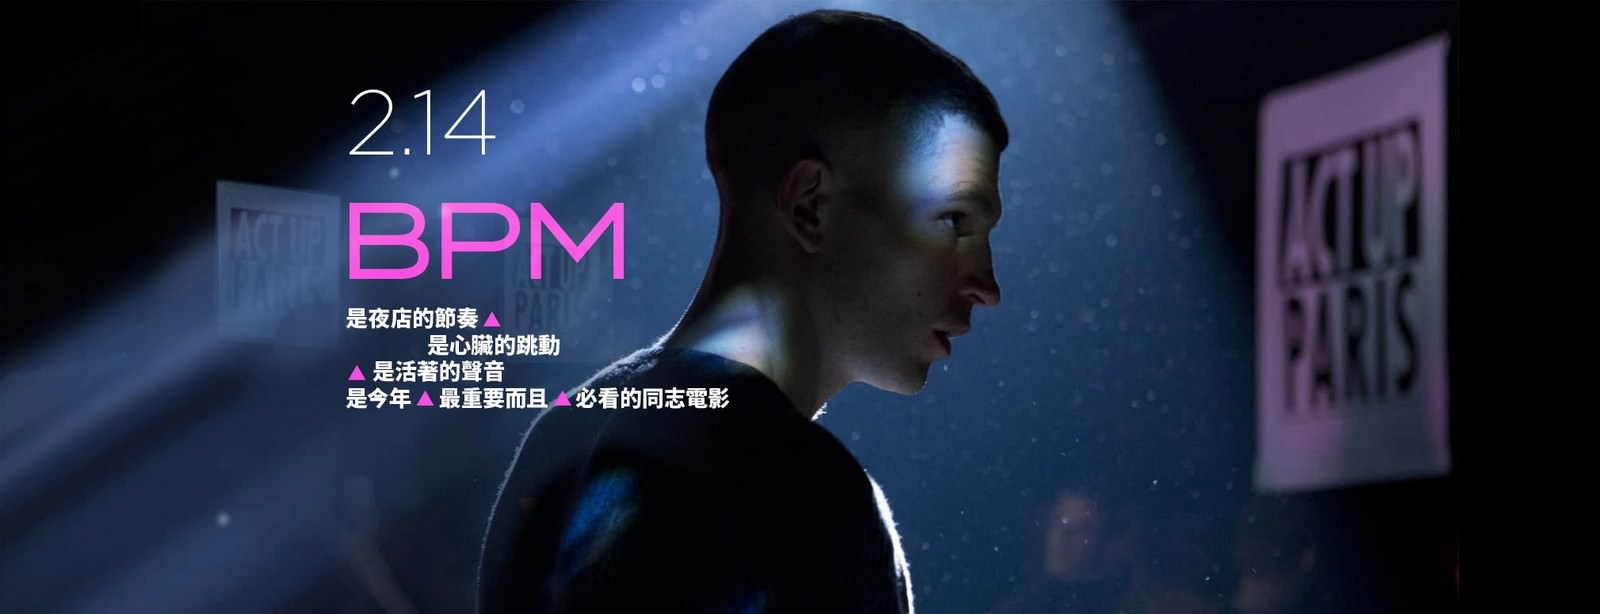 Movie, 120 battements par minute(法國) / BPM(台) / 每分钟120击(網), 電影海報, 台灣, 橫版